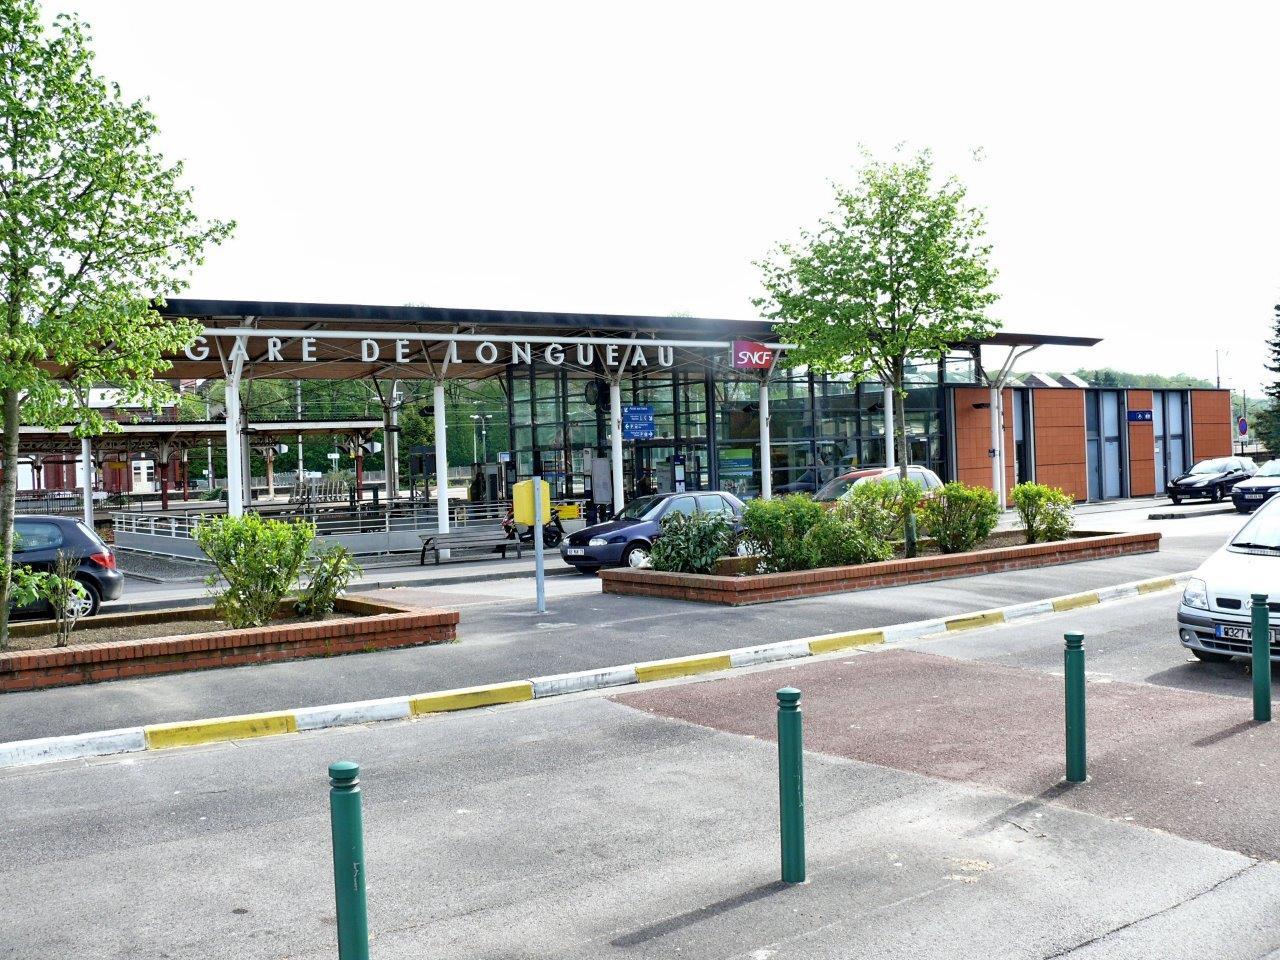 gare-de-longueau-train-station